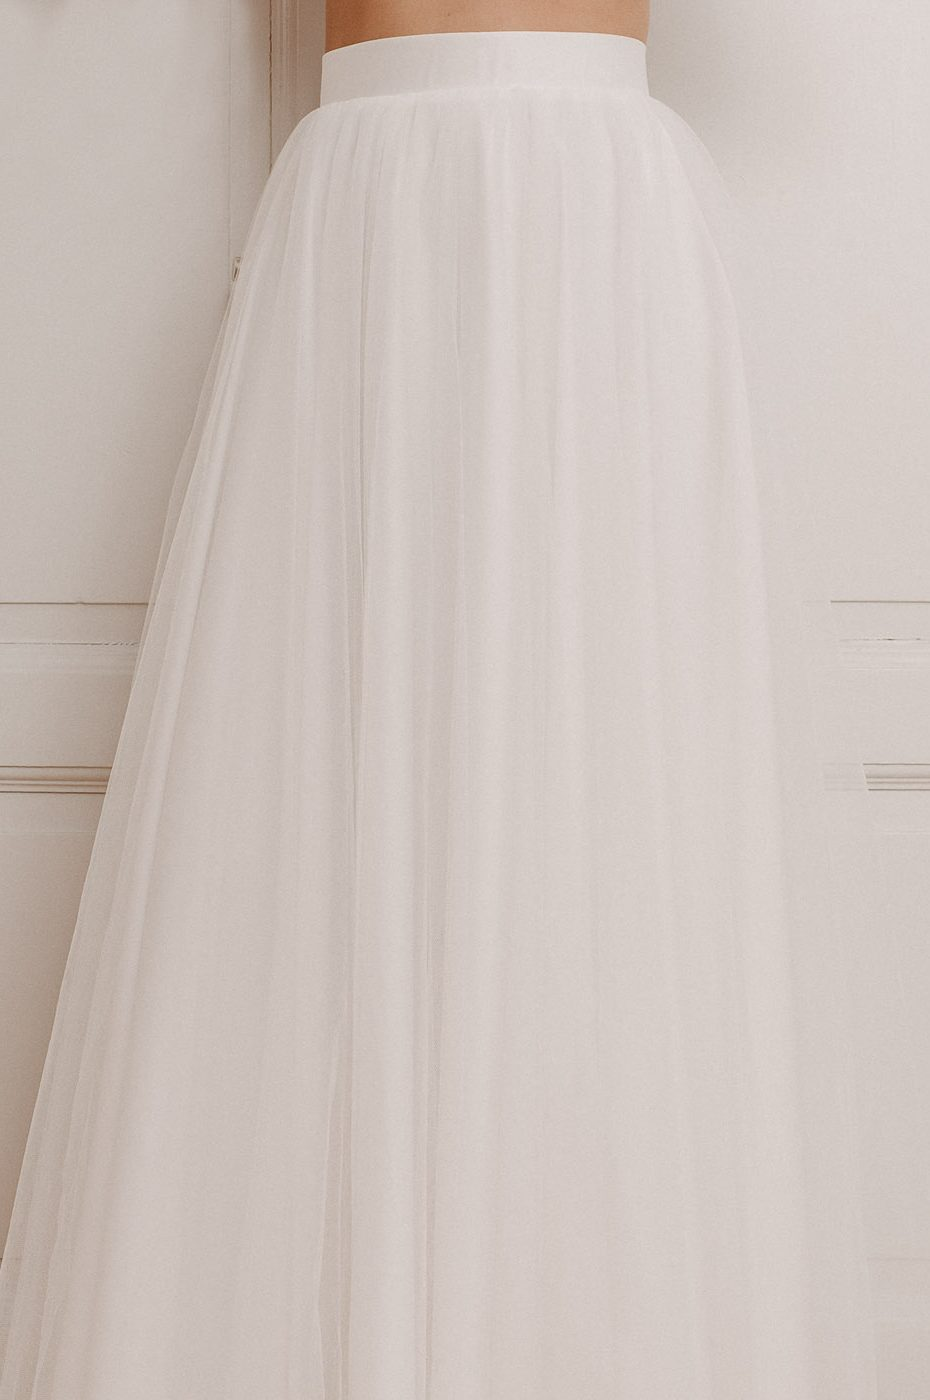 Lime Tüll-Rock - Mix & Match Brautmode von Oonce